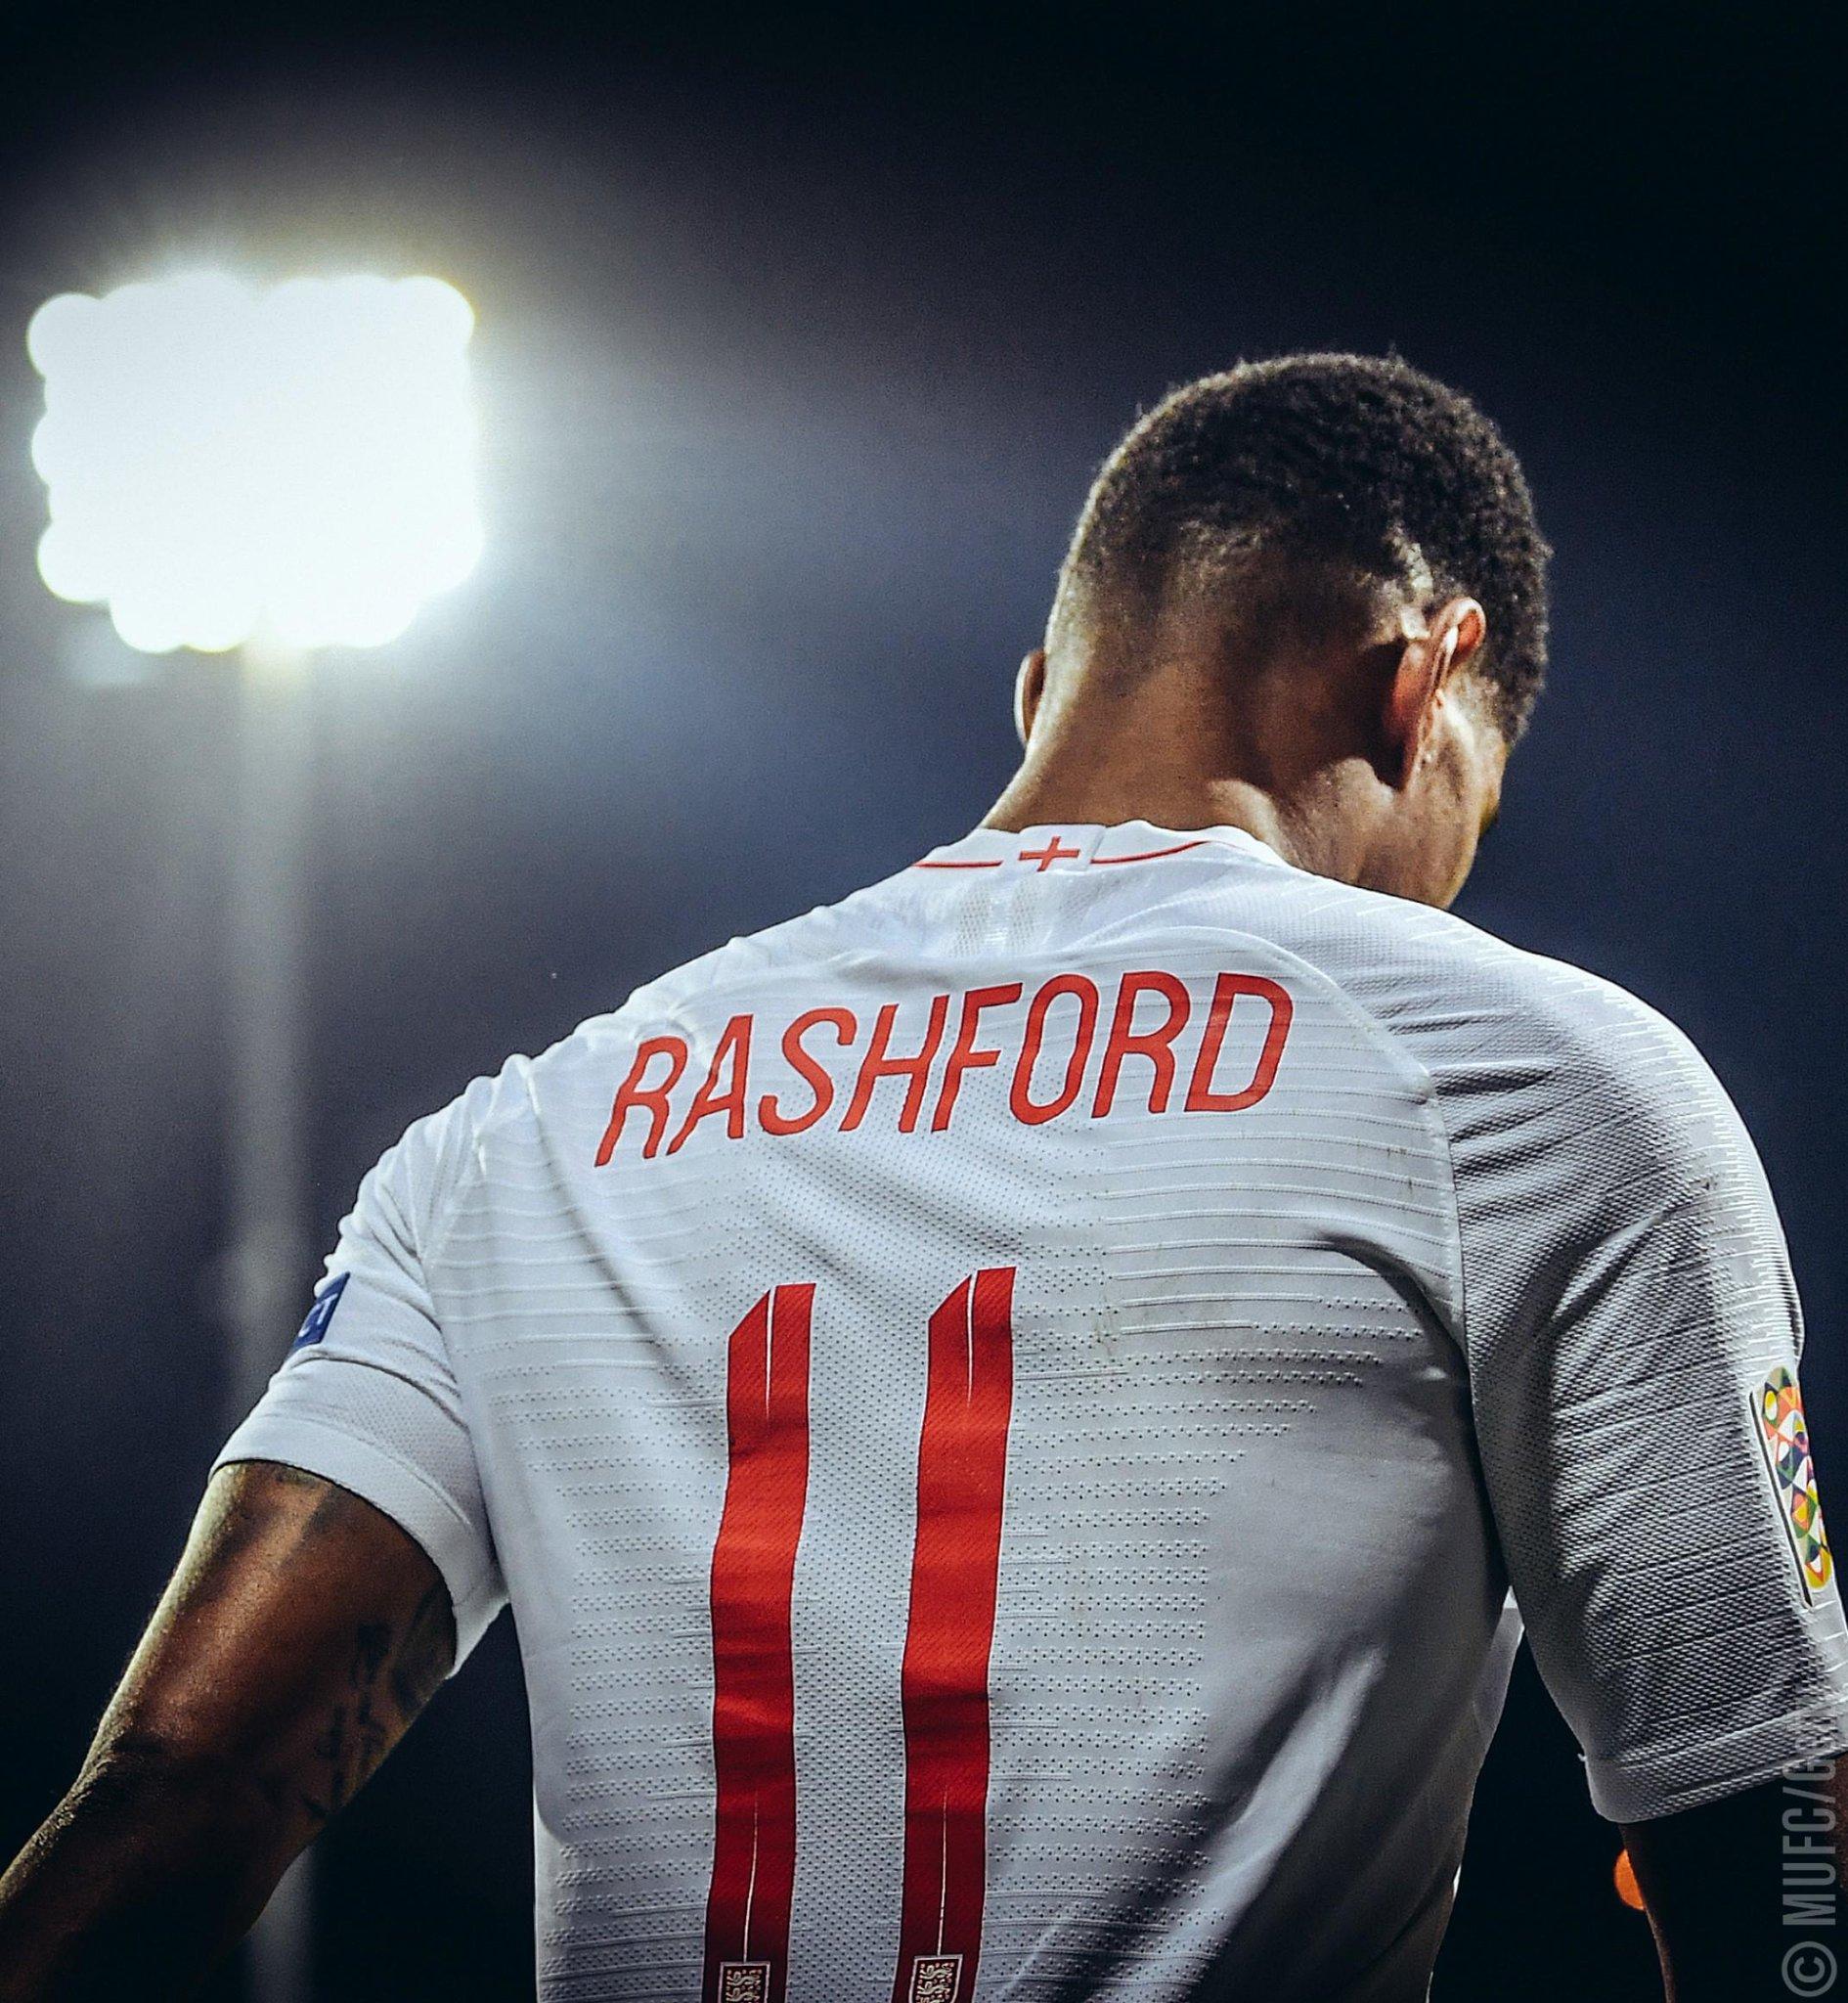 Opinion: There is too much noise around Marcus Rashford.  ➡️ https://t.co/GgVU2RqNzT https://t.co/rMYOzAFQq0